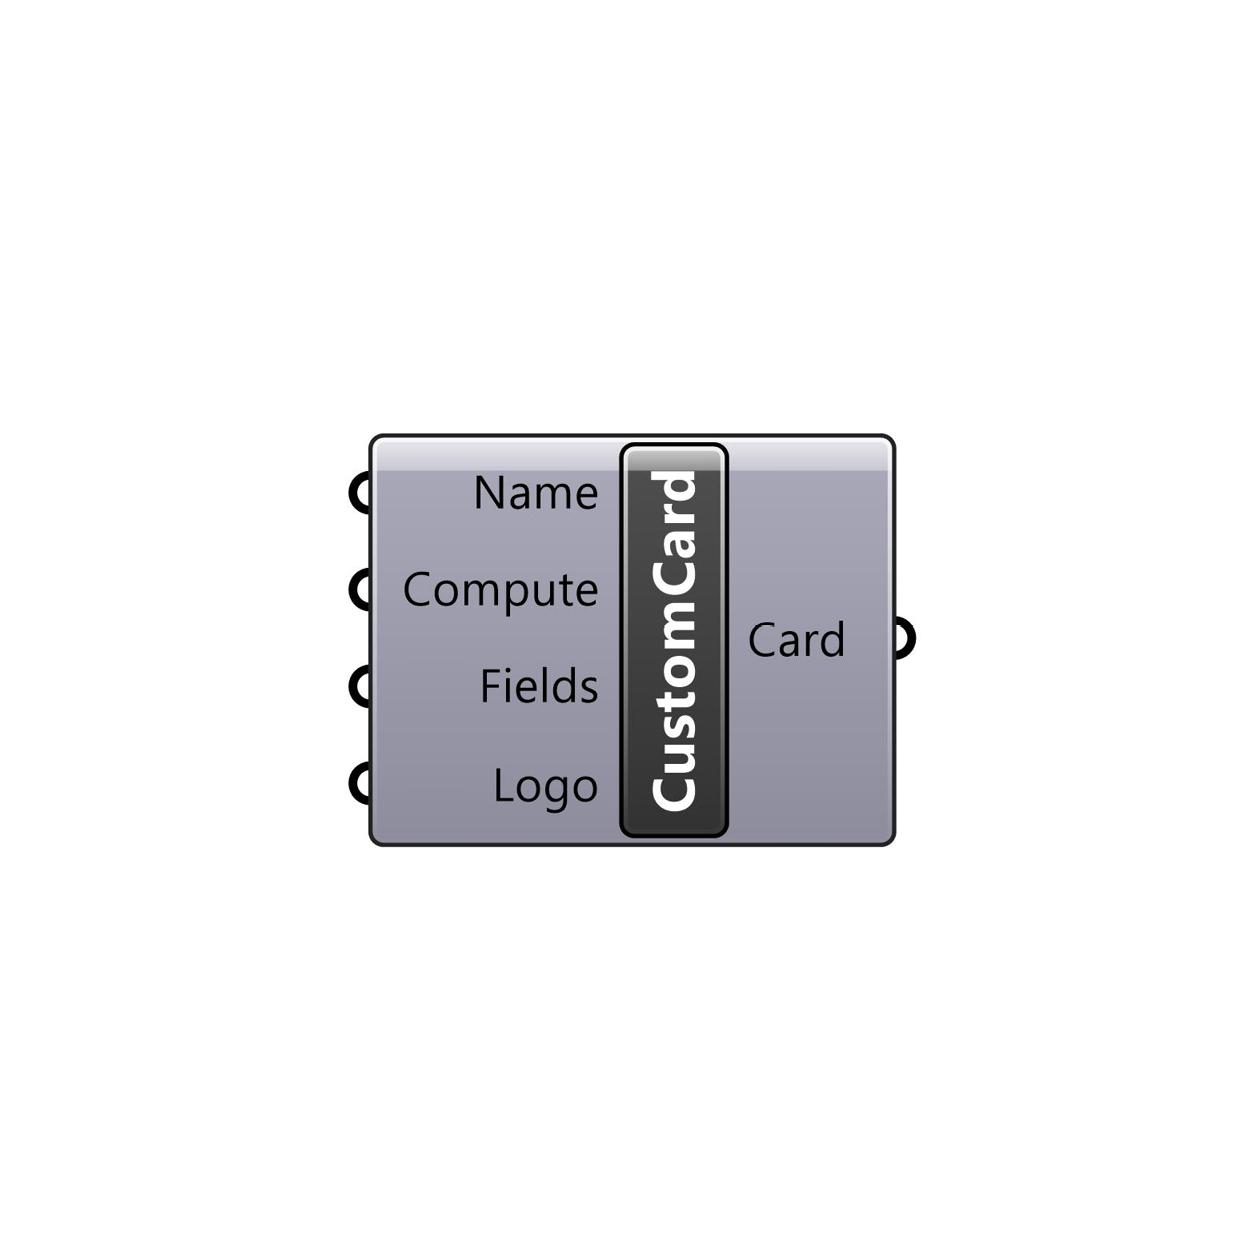 Custom Card component